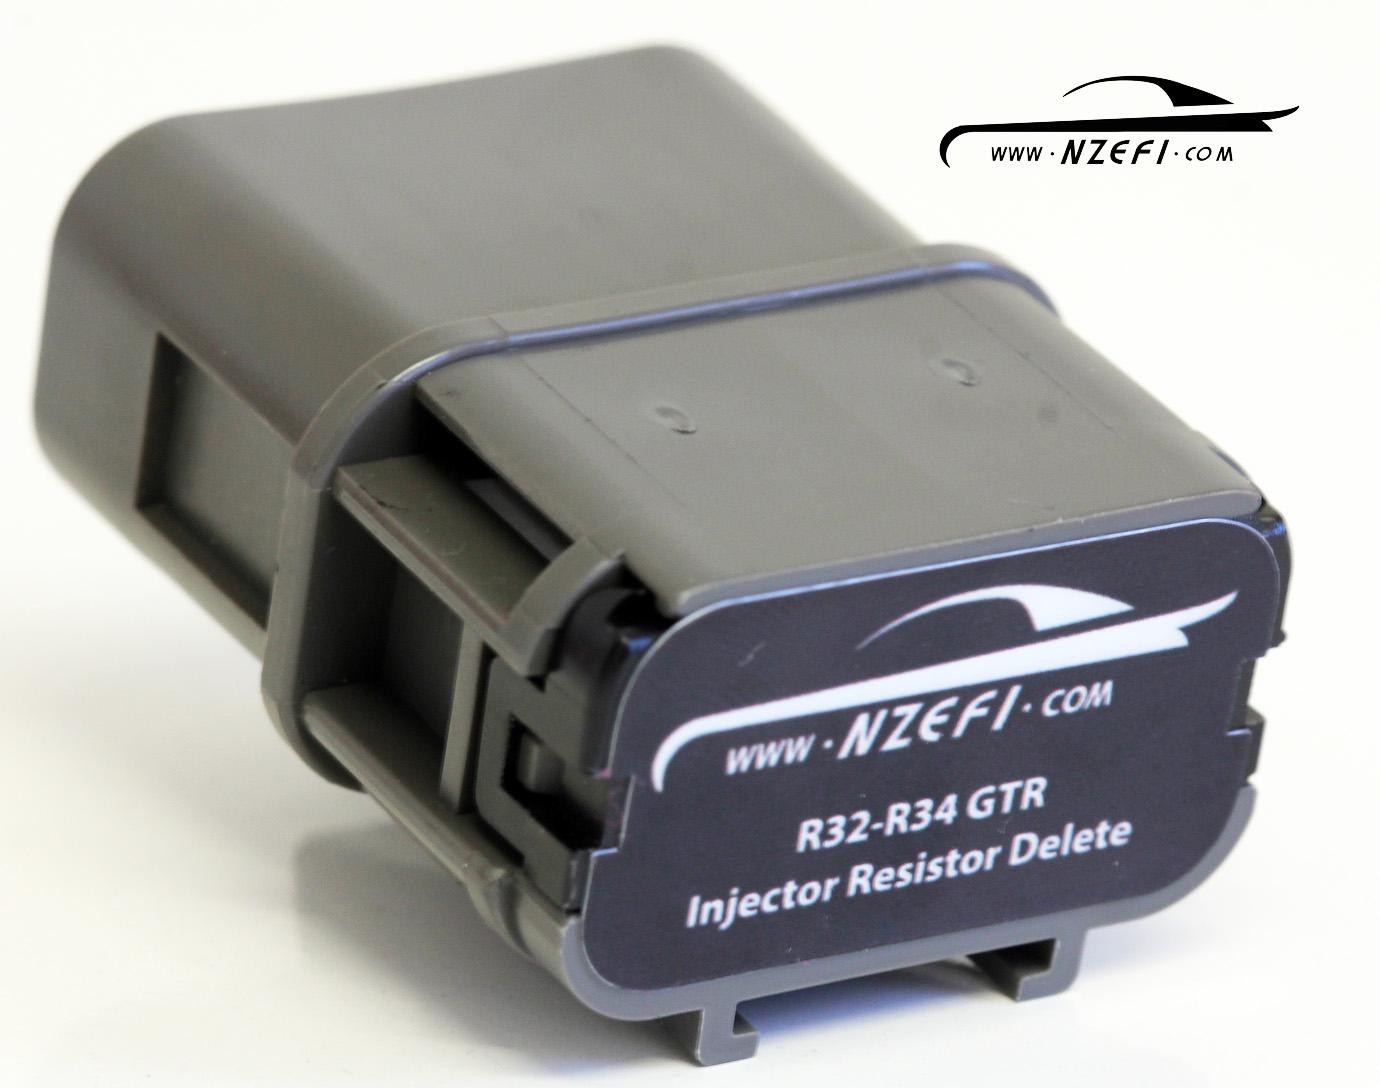 hight resolution of r32 r34 nissan gtr injector ballast resistor delete